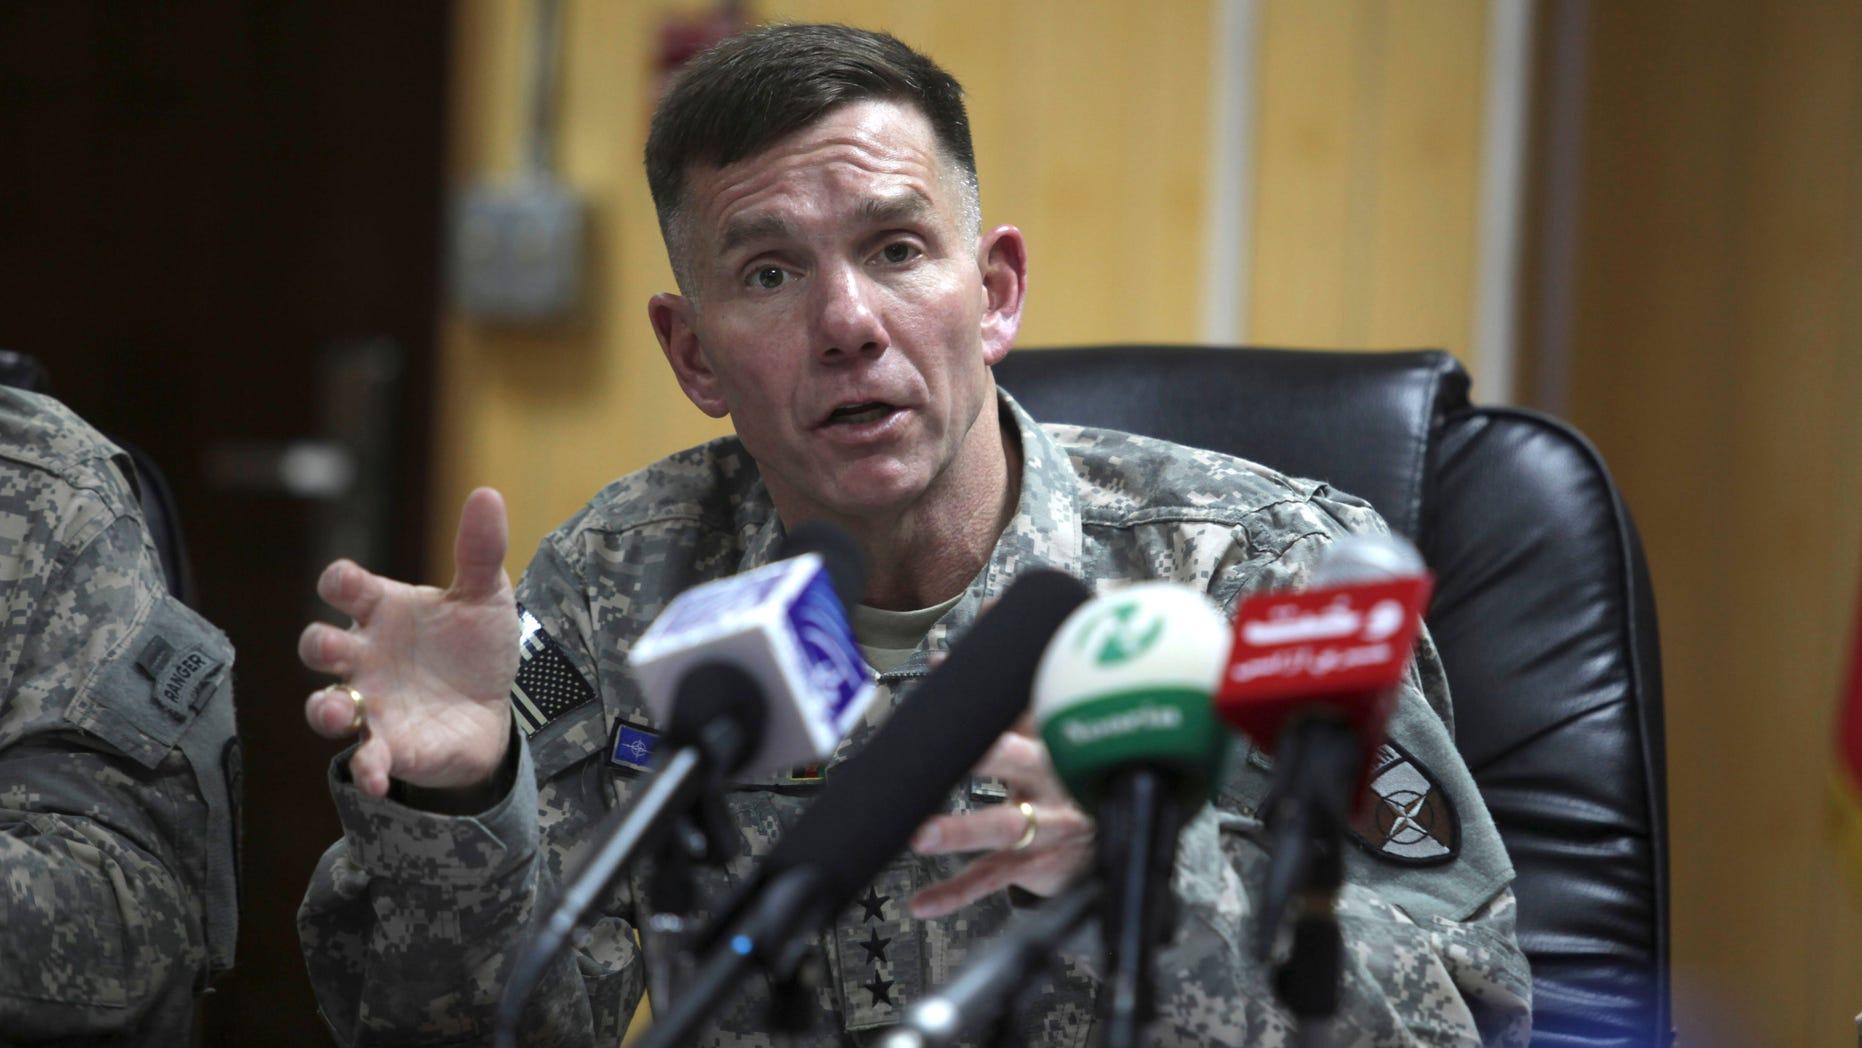 Jan. 5: Lt. Gen. William  B. Caldwell IV, commander of NATO Training Mission-Afghanistan addresses a press conference in Kabul, Afghanistan.